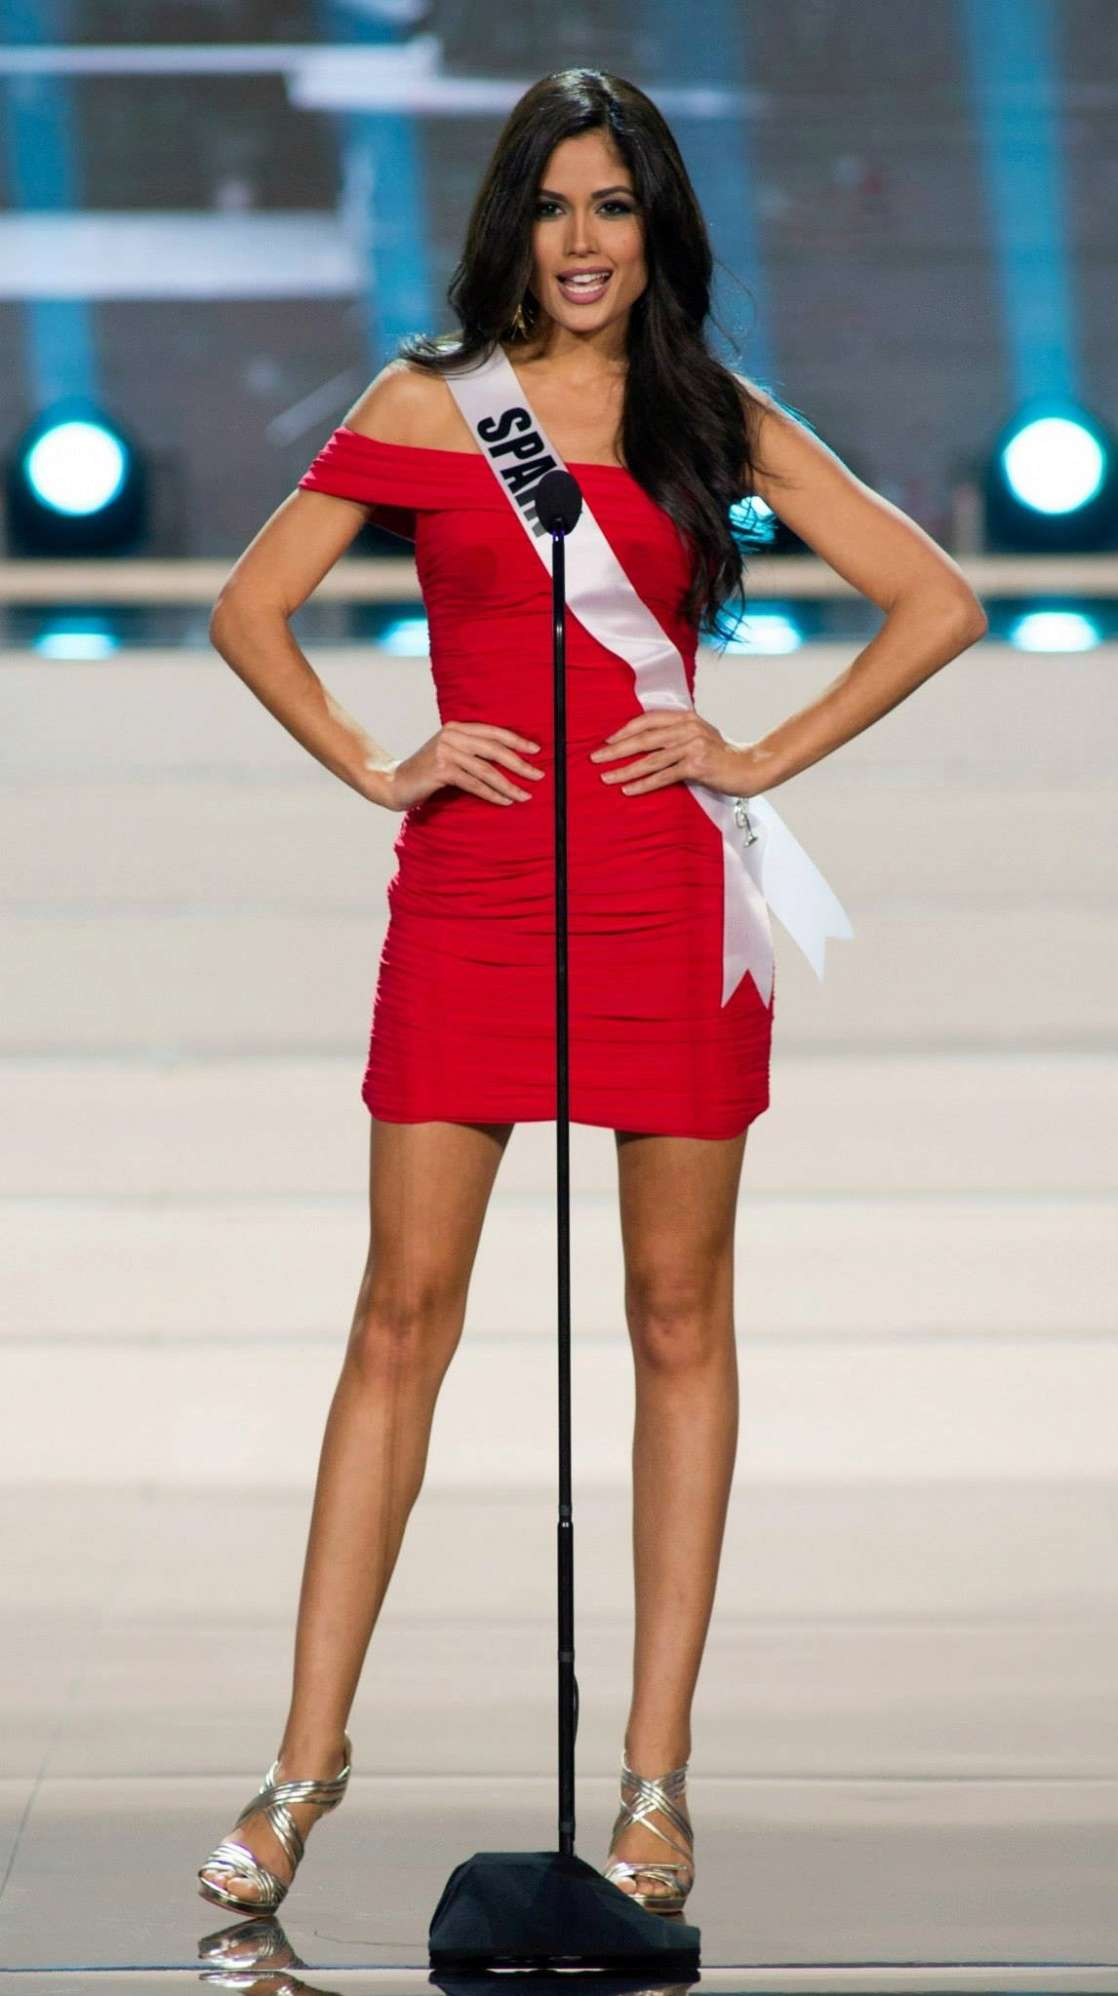 patricia yurena rodriguez, miss espana 2008/2013, 1st runner-up de miss universe 2013. - Página 3 1118fu24